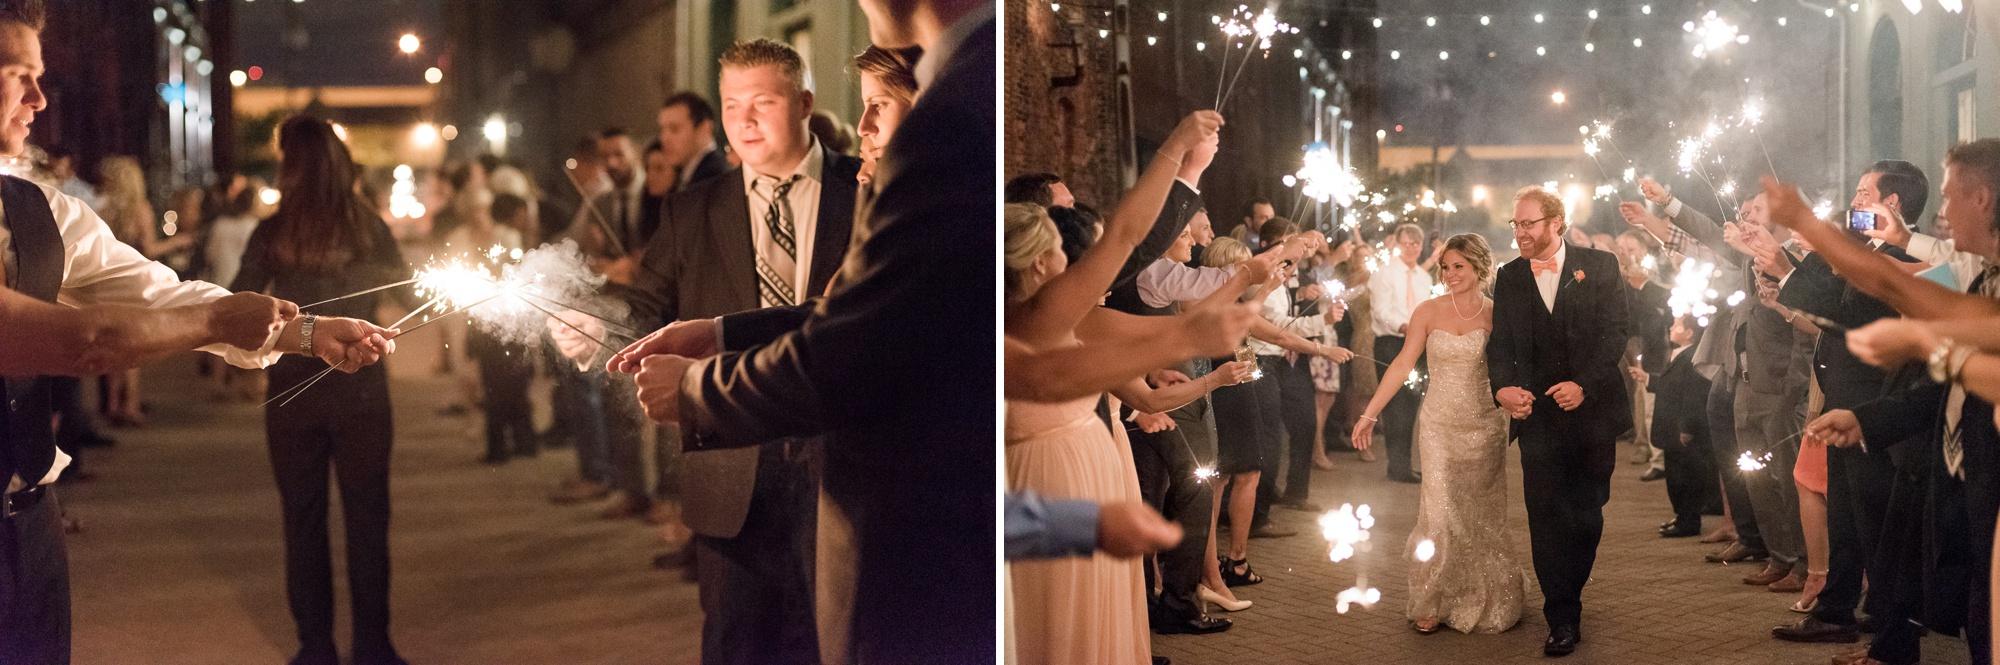 via-vecchia-winery-wedding-columbus-ohio-126.jpg